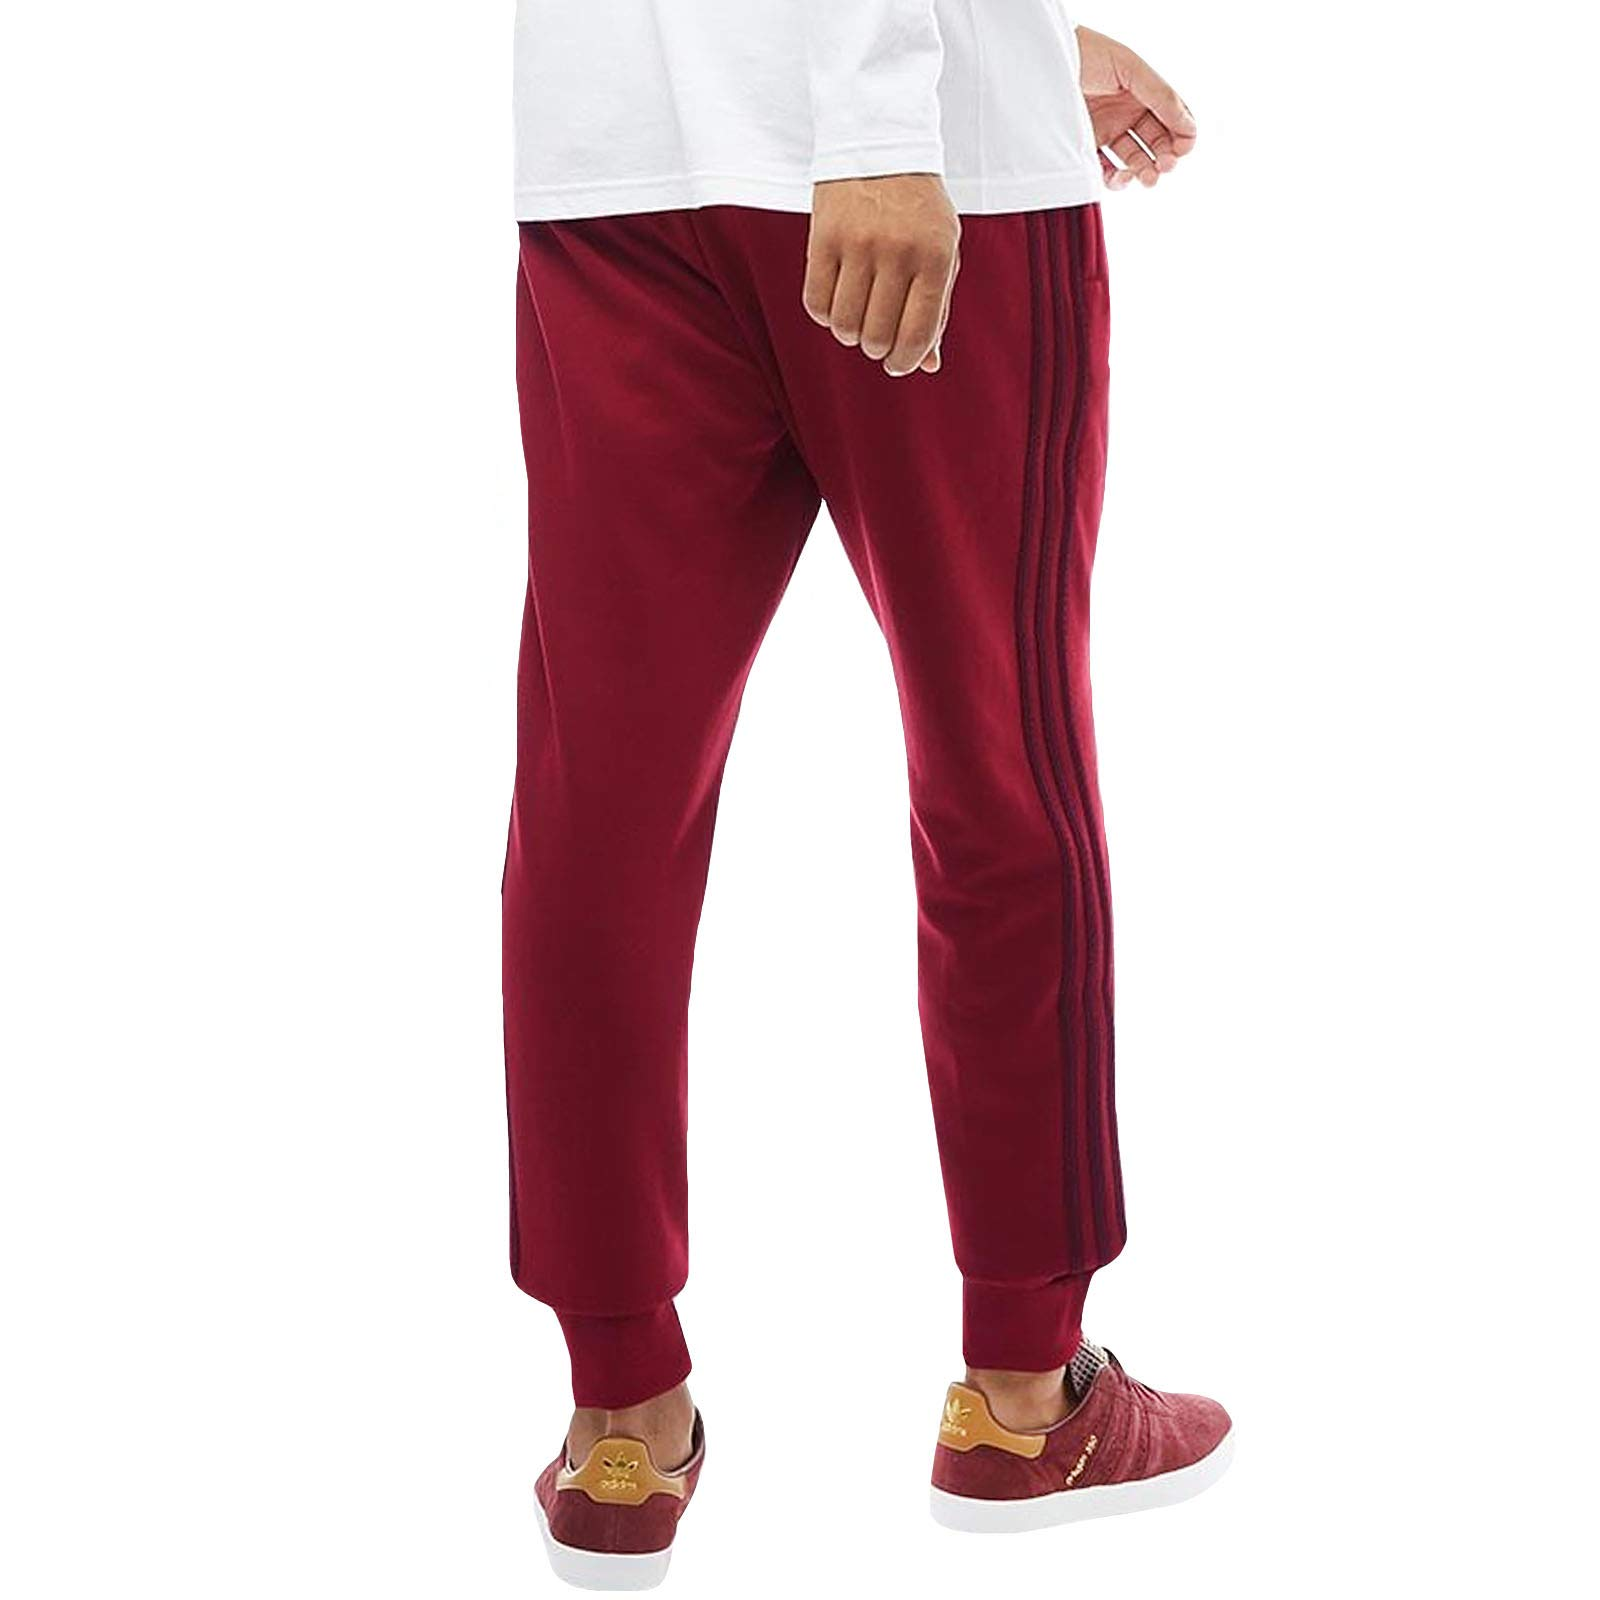 adidas pantaloni uomo bordeaux